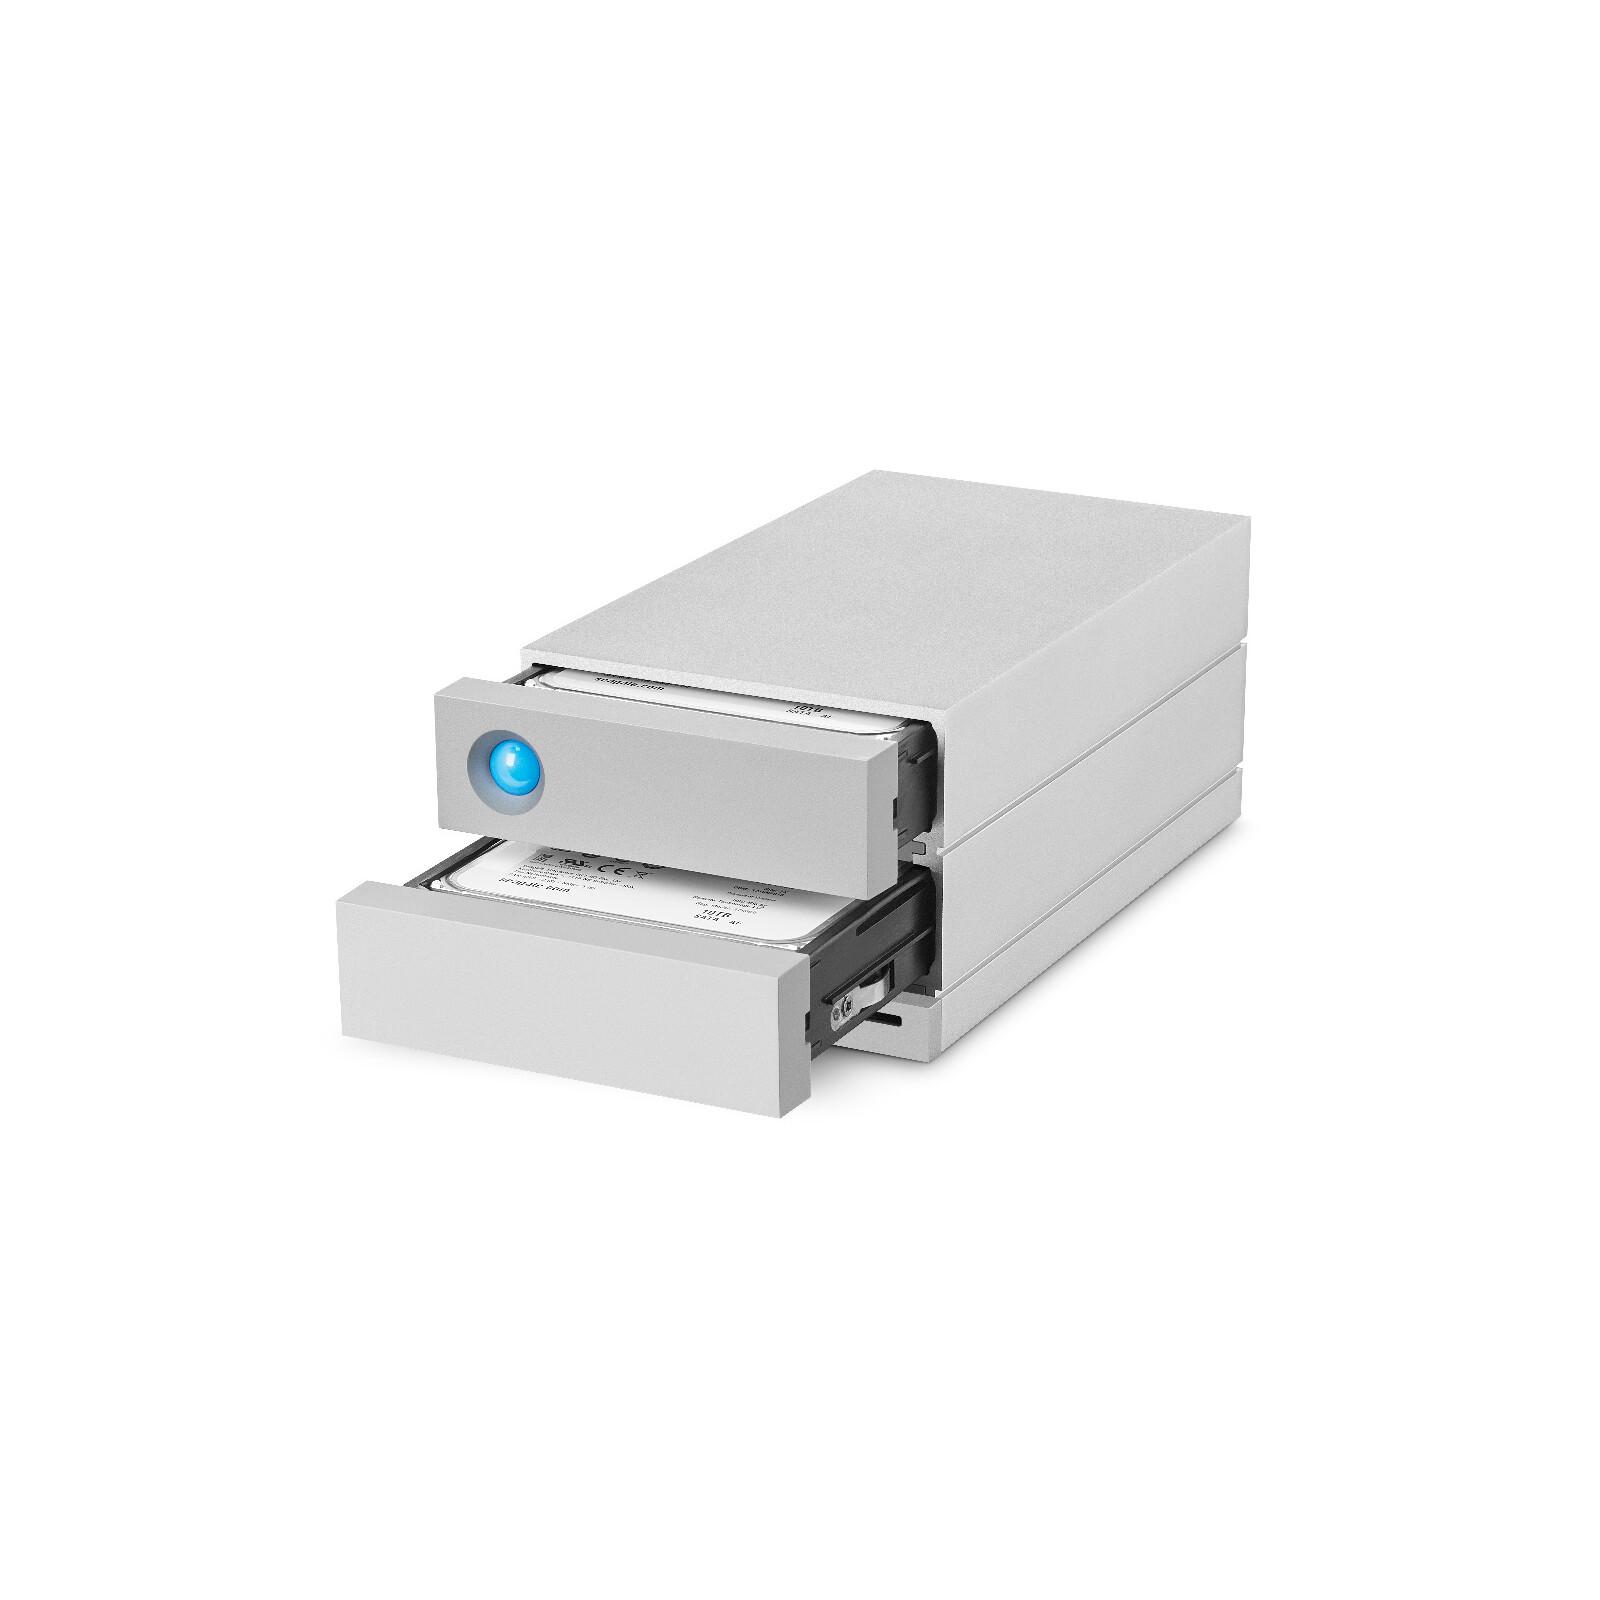 LaCie 2big Dock 8TB Thunderbolt 3, DAS